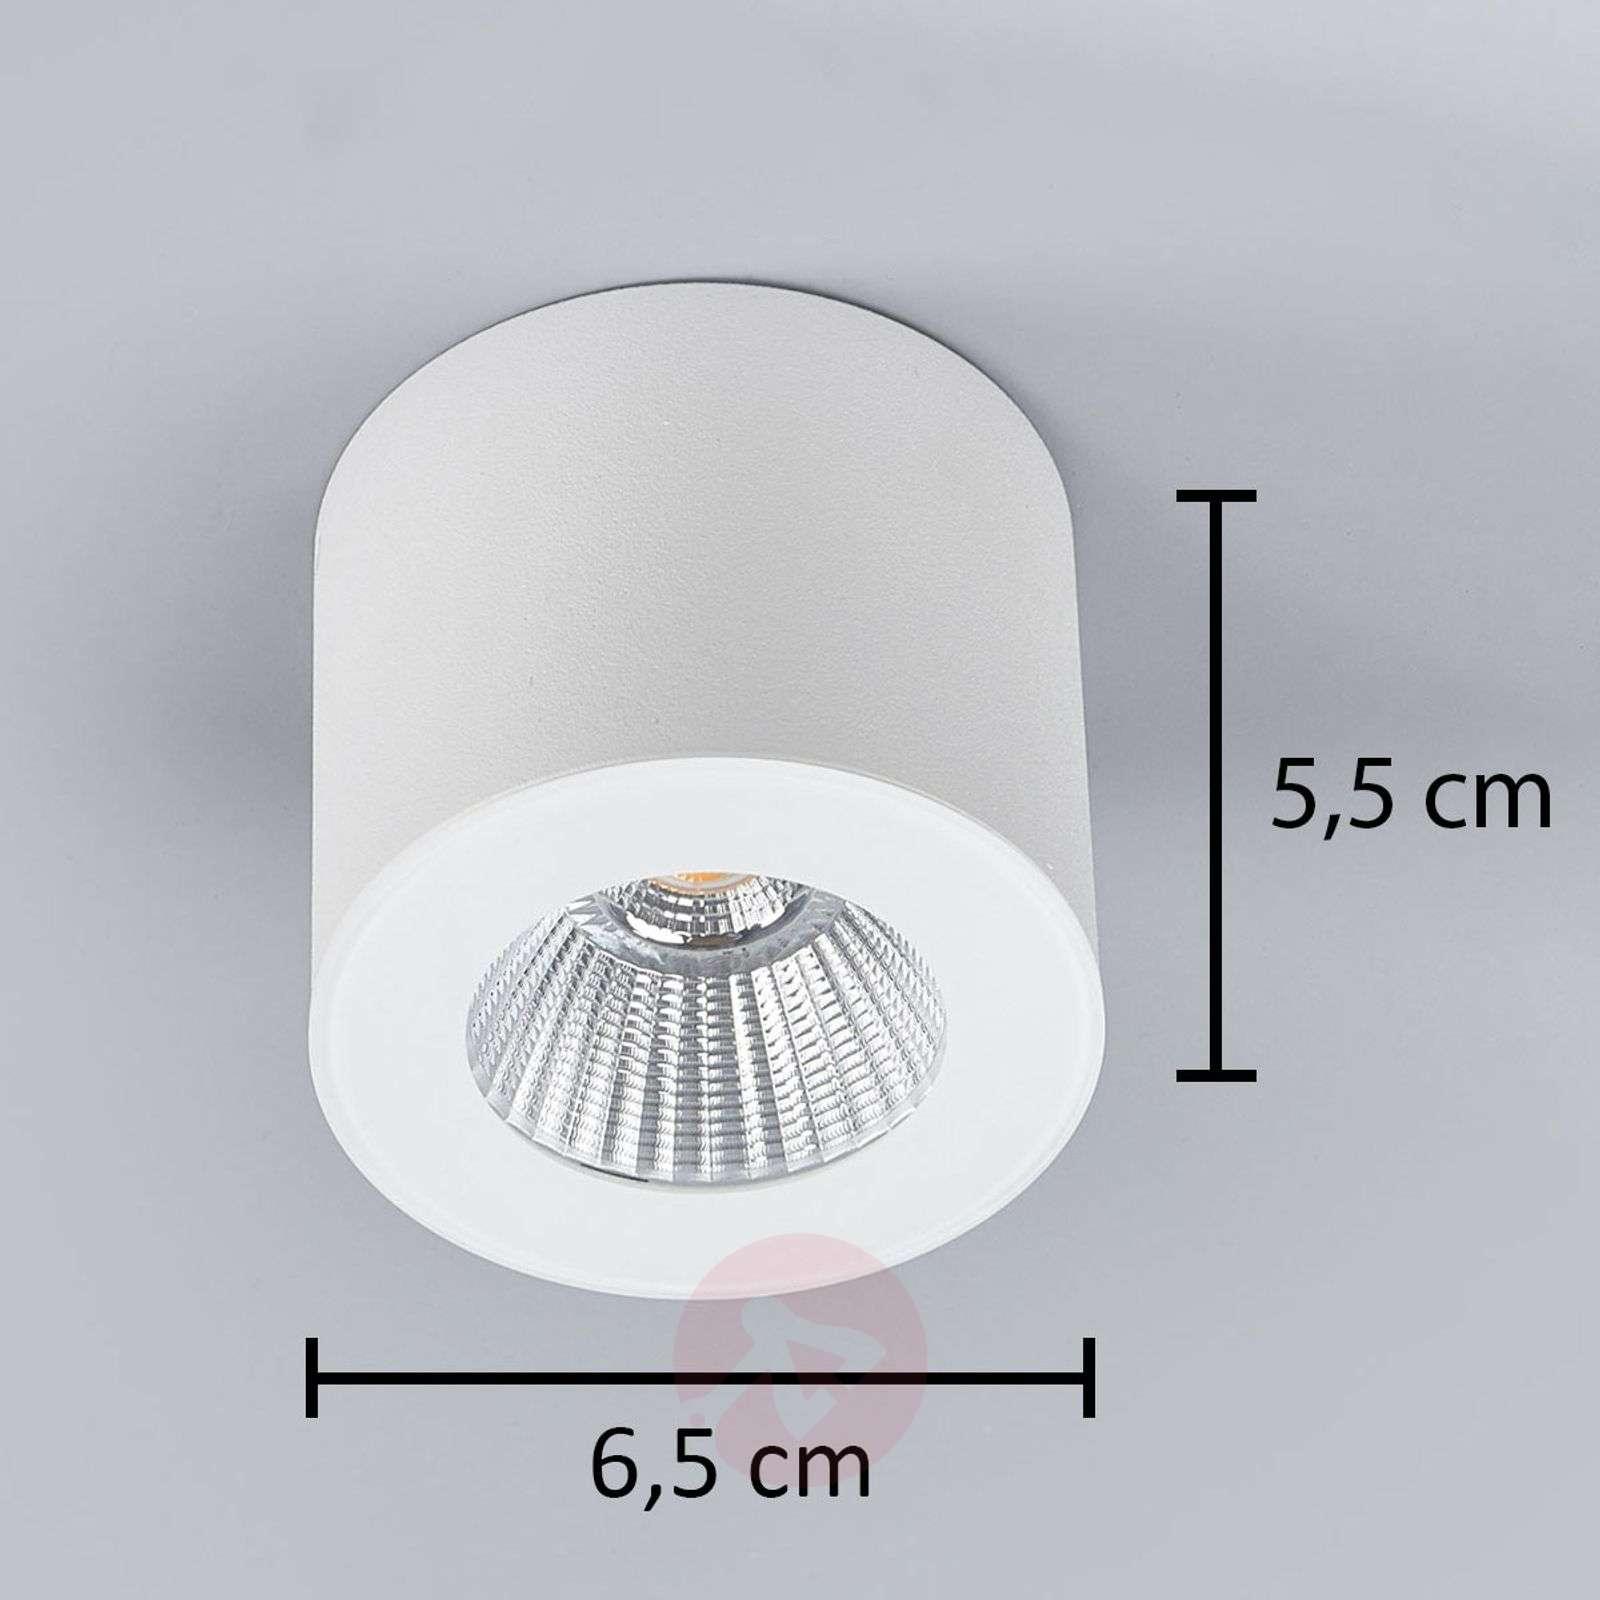 Helestra Oso LED ceiling spot, round, matt white-4516442-08